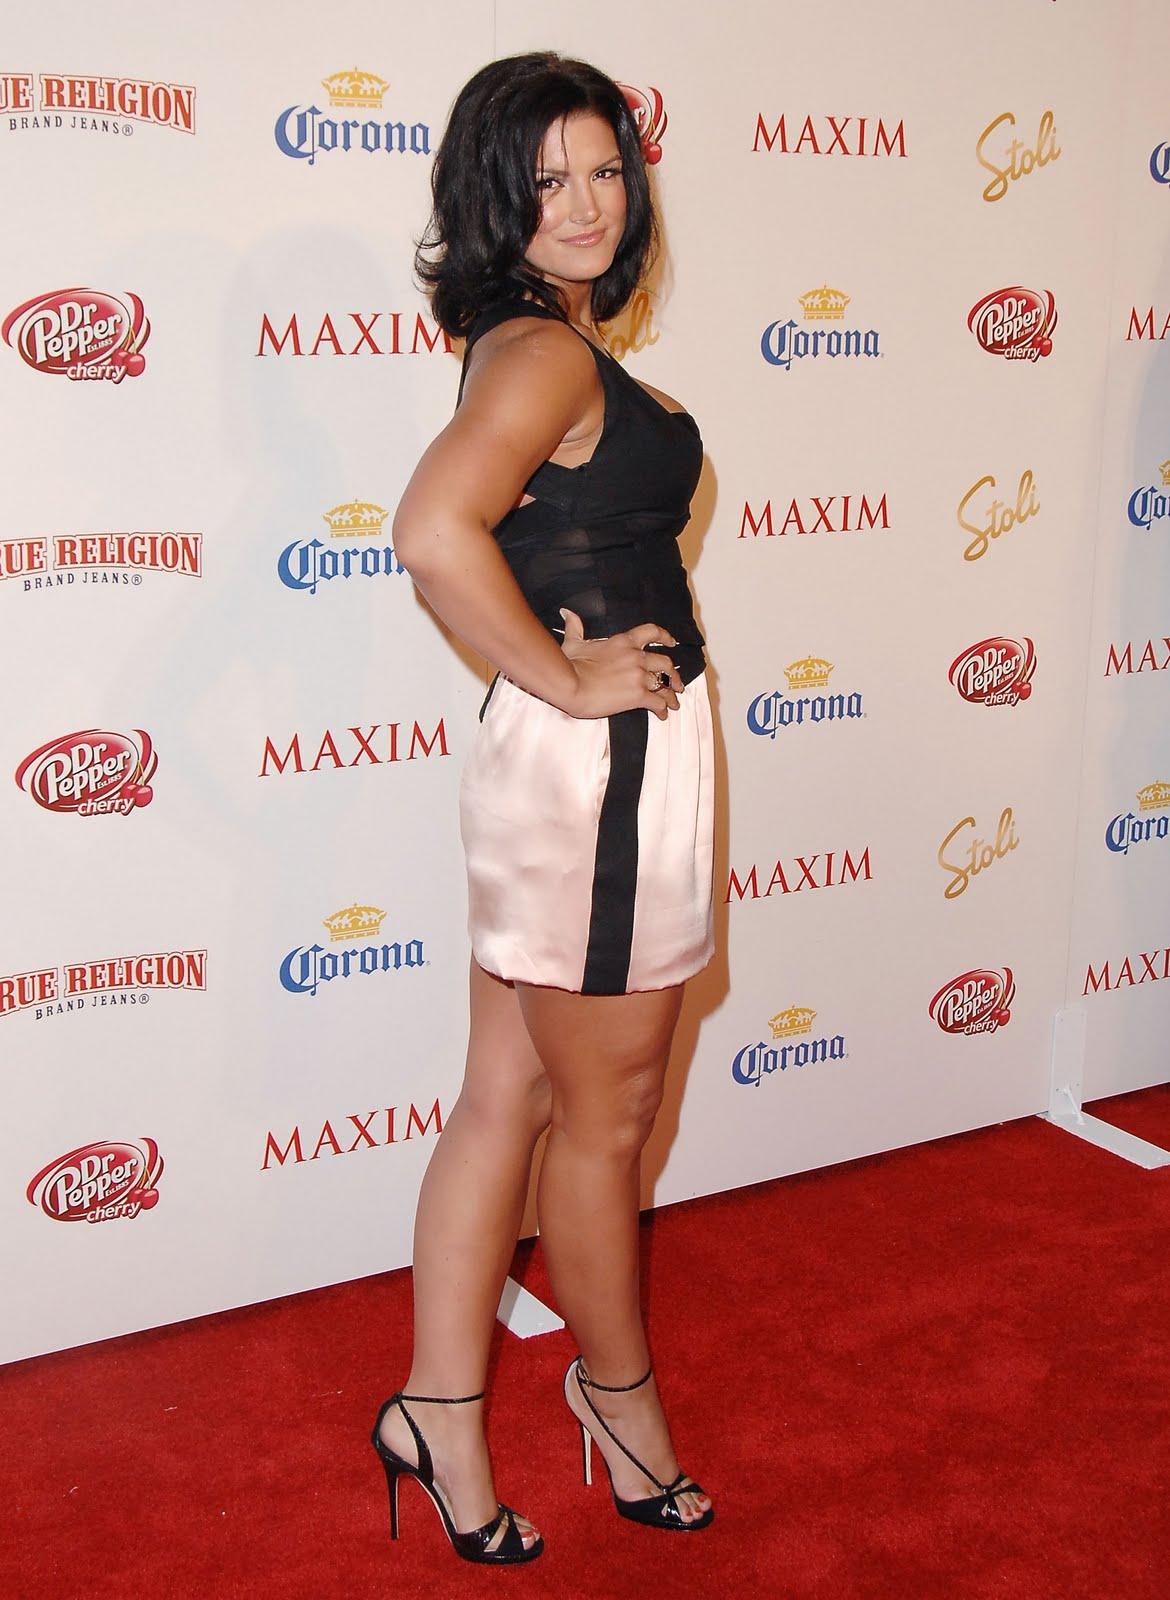 Feet Gina Carano naked (89 photos), Topless, Paparazzi, Feet, swimsuit 2015